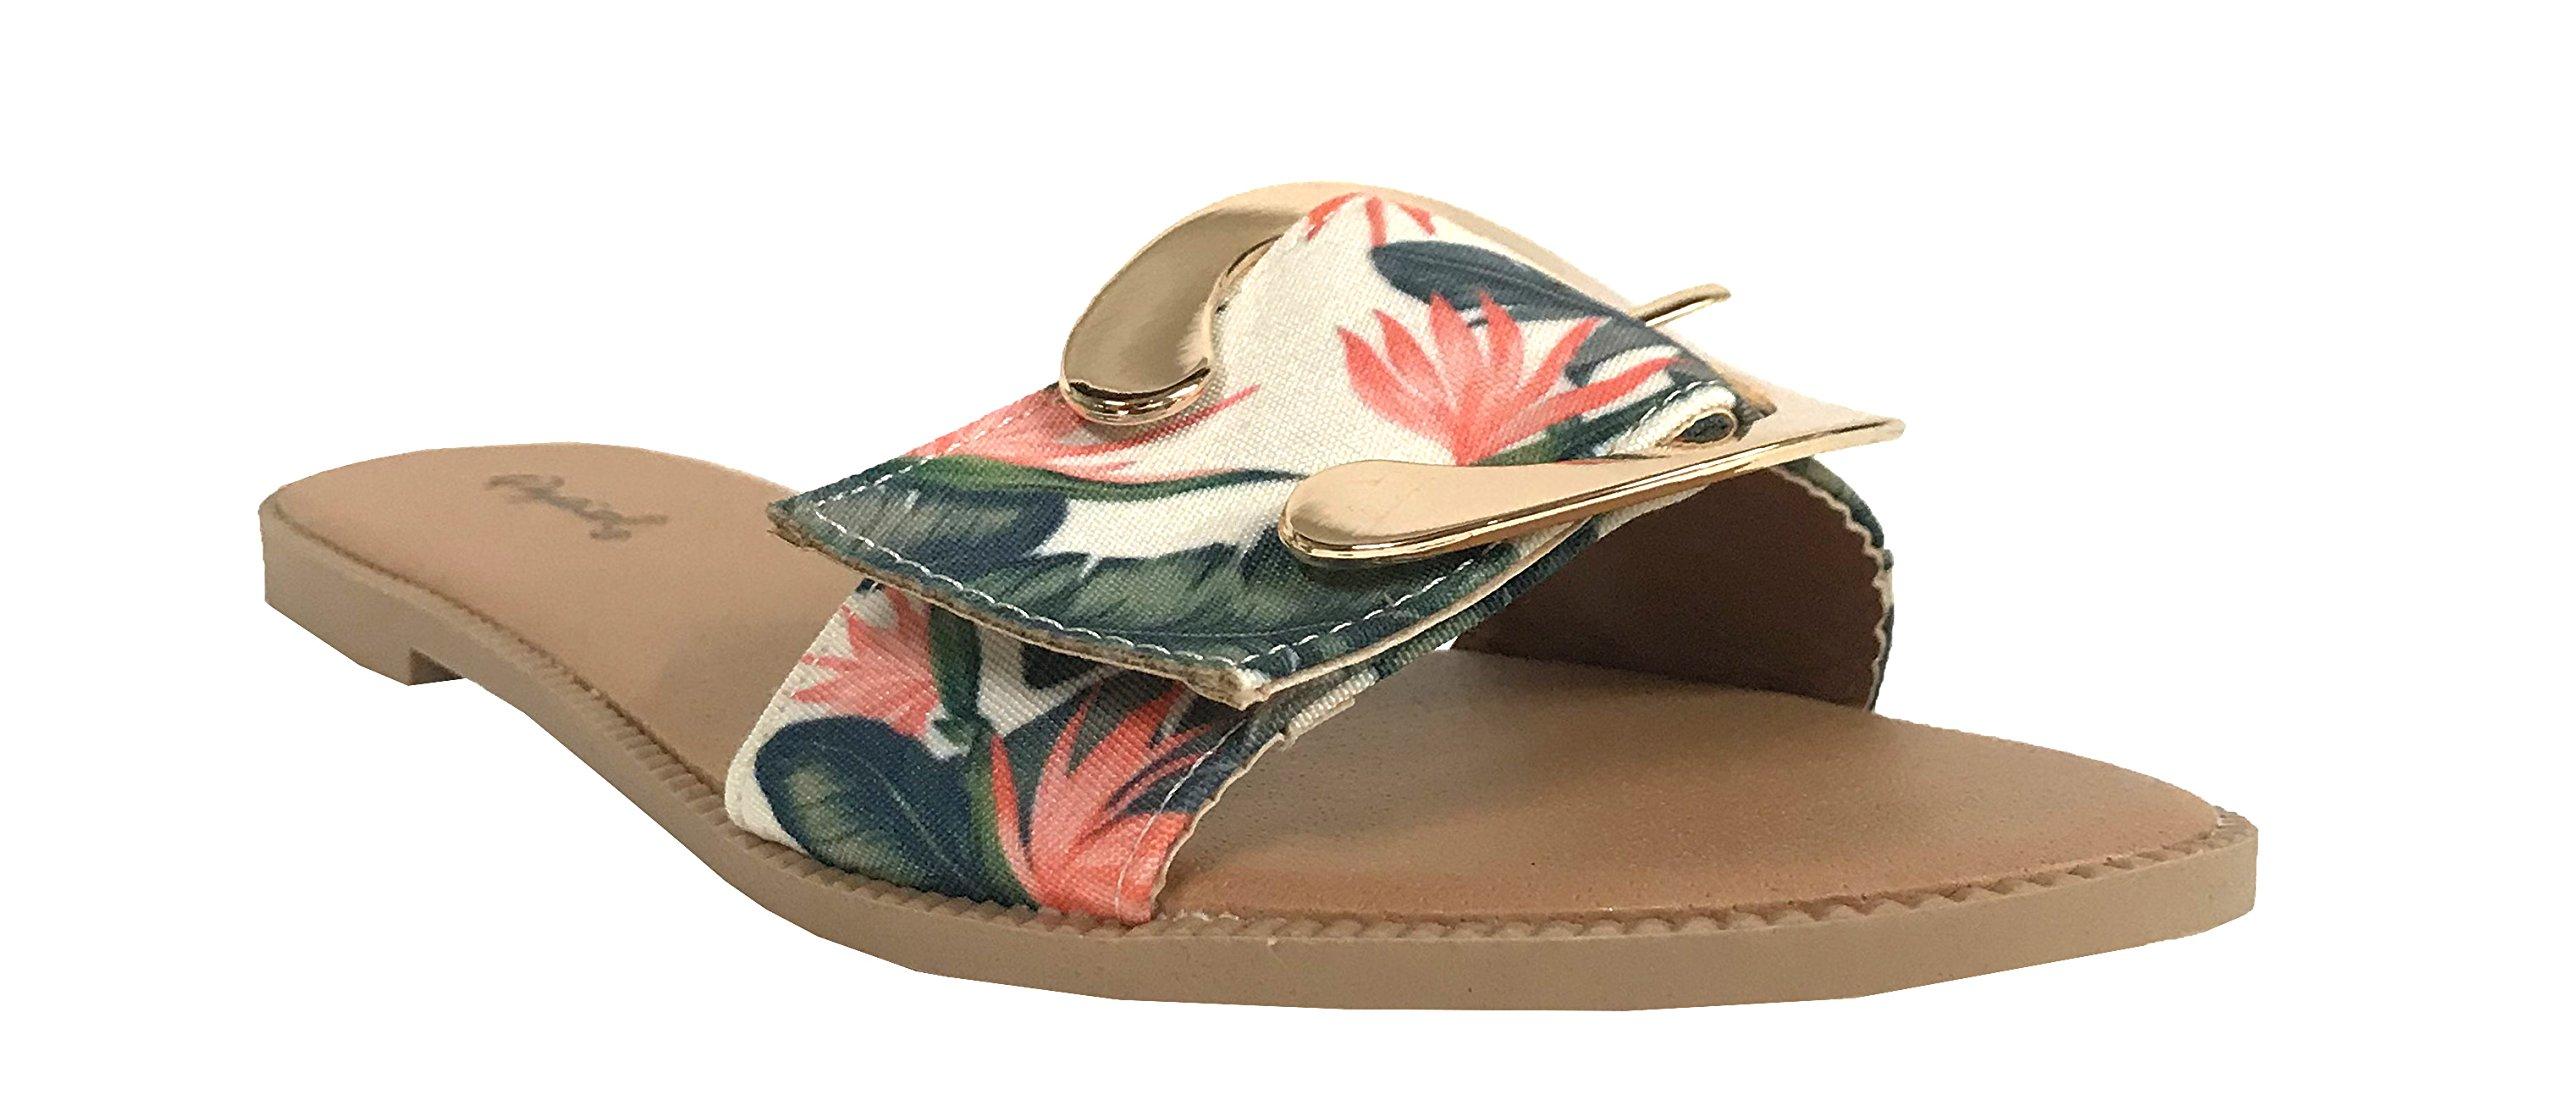 Qupid Desmond-5 Women's Metallic Accent Detaling Slide Sandals, Green Coral Flower Fabric 10 M US